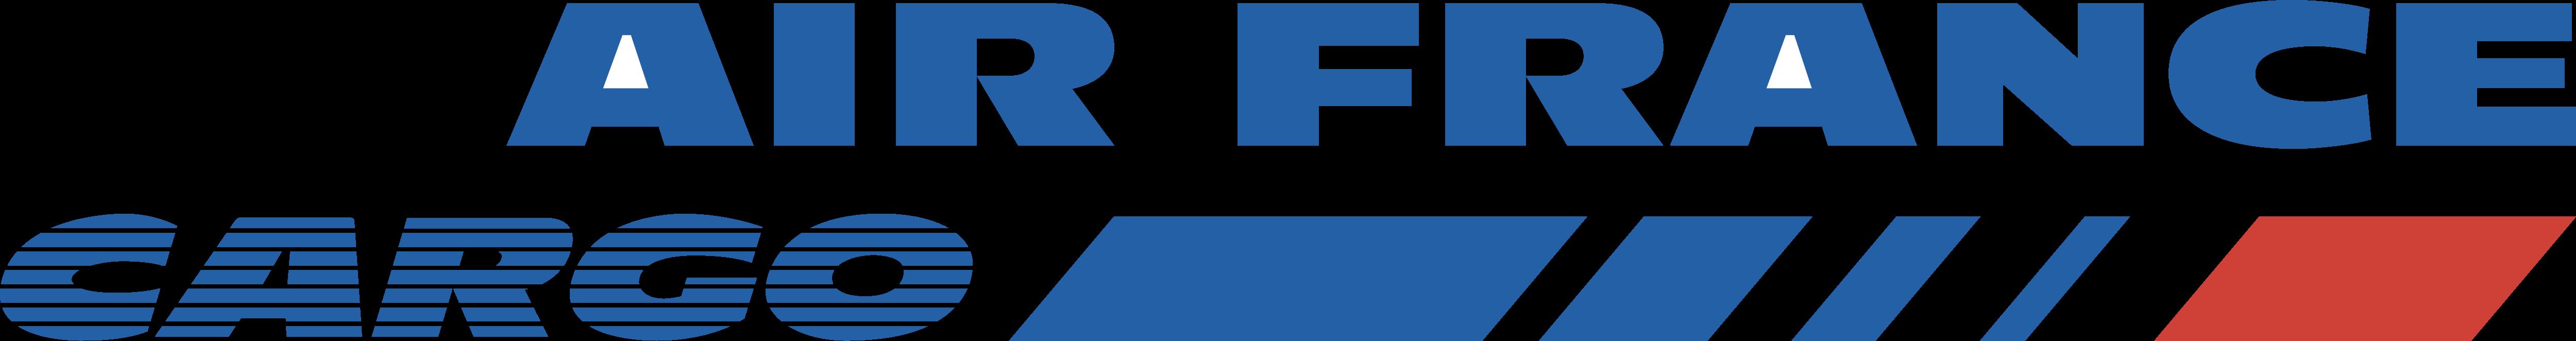 Air France - Air France Logo PNG